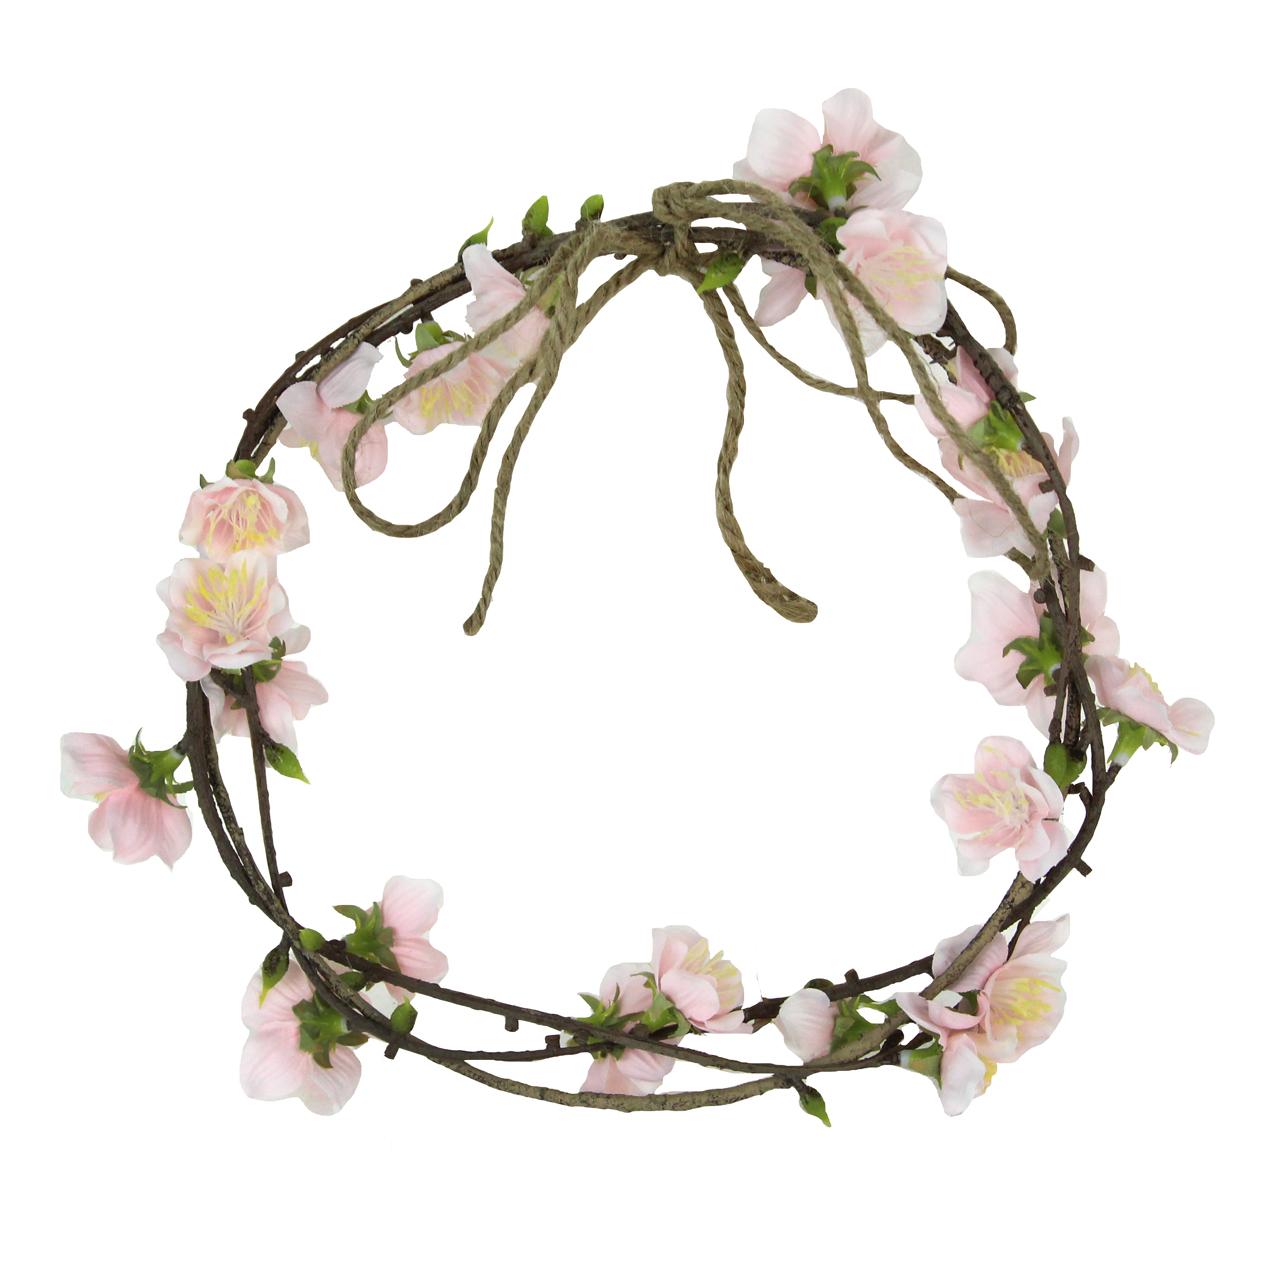 Coronita Cu Flori De Cires 20 Cm